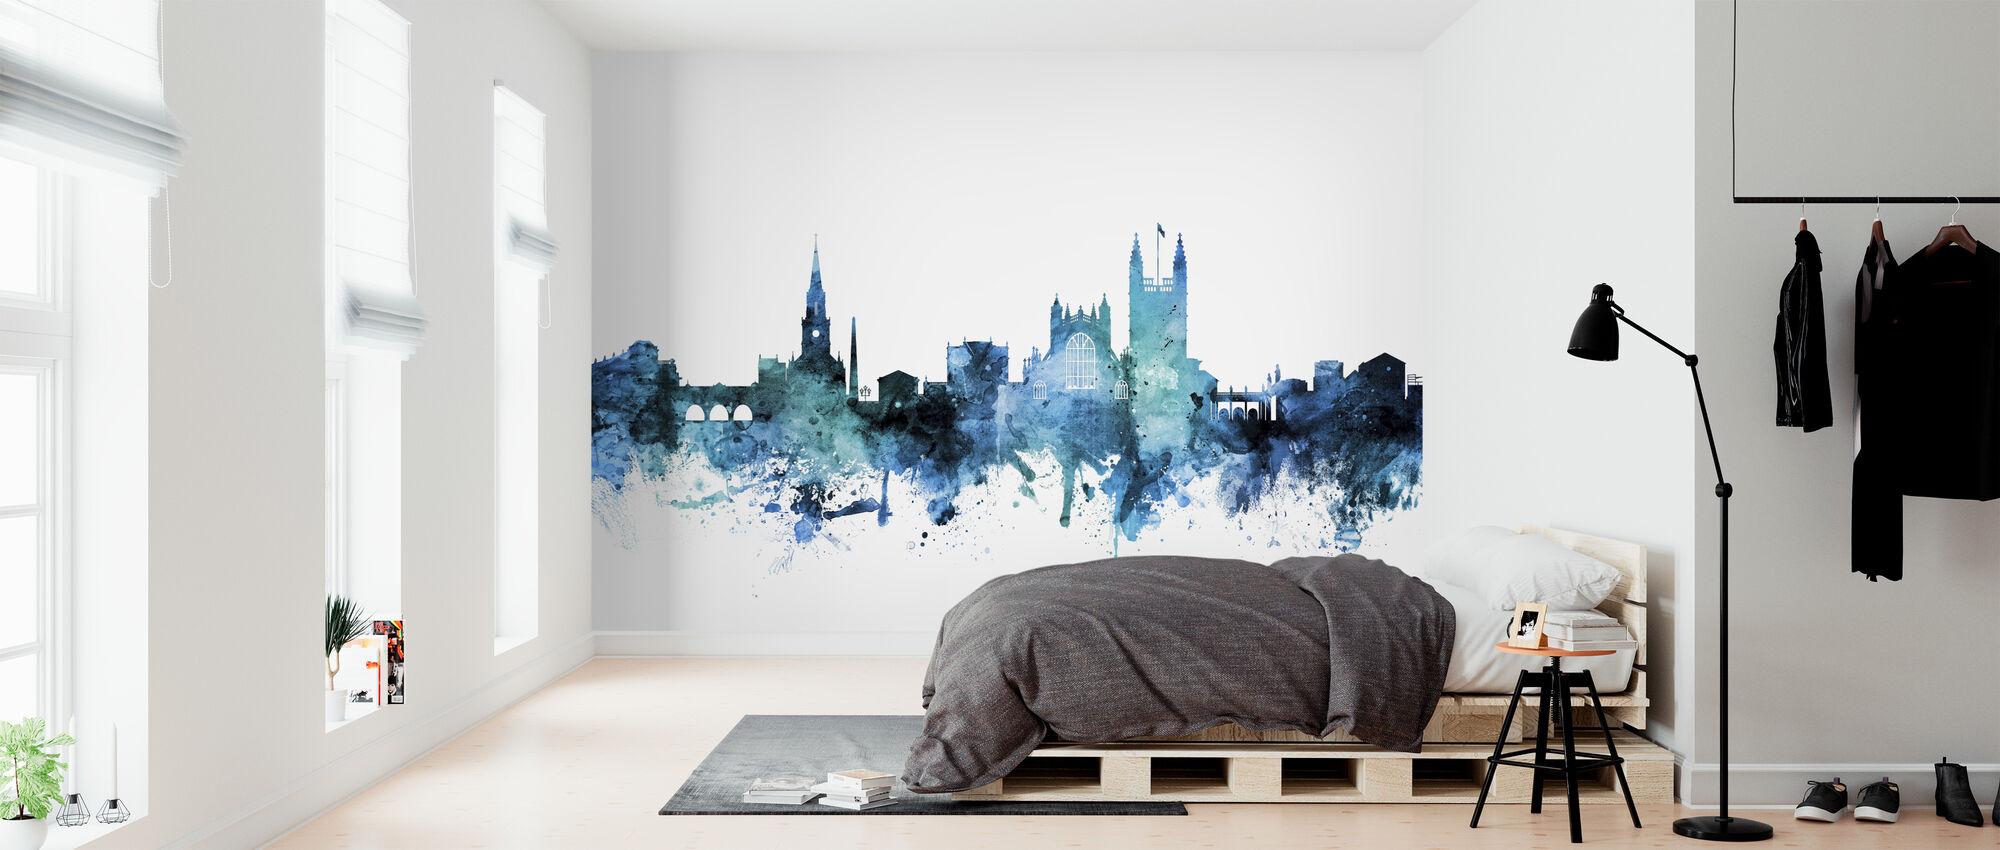 Bath England Skyline Cityscape - Wallpaper - Bedroom